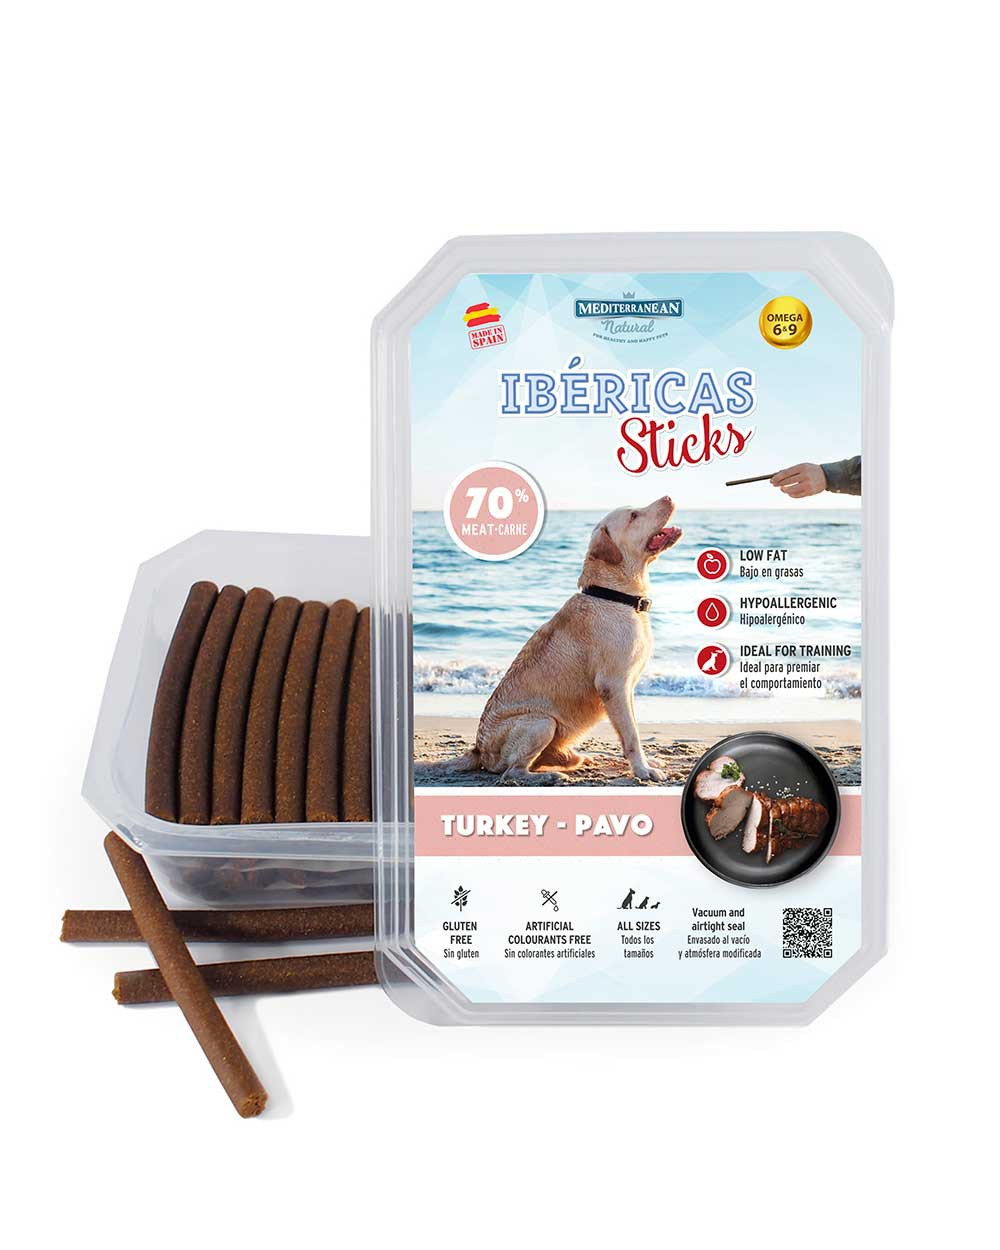 ibericas sticks de pavo para perros Mediterranean Natural